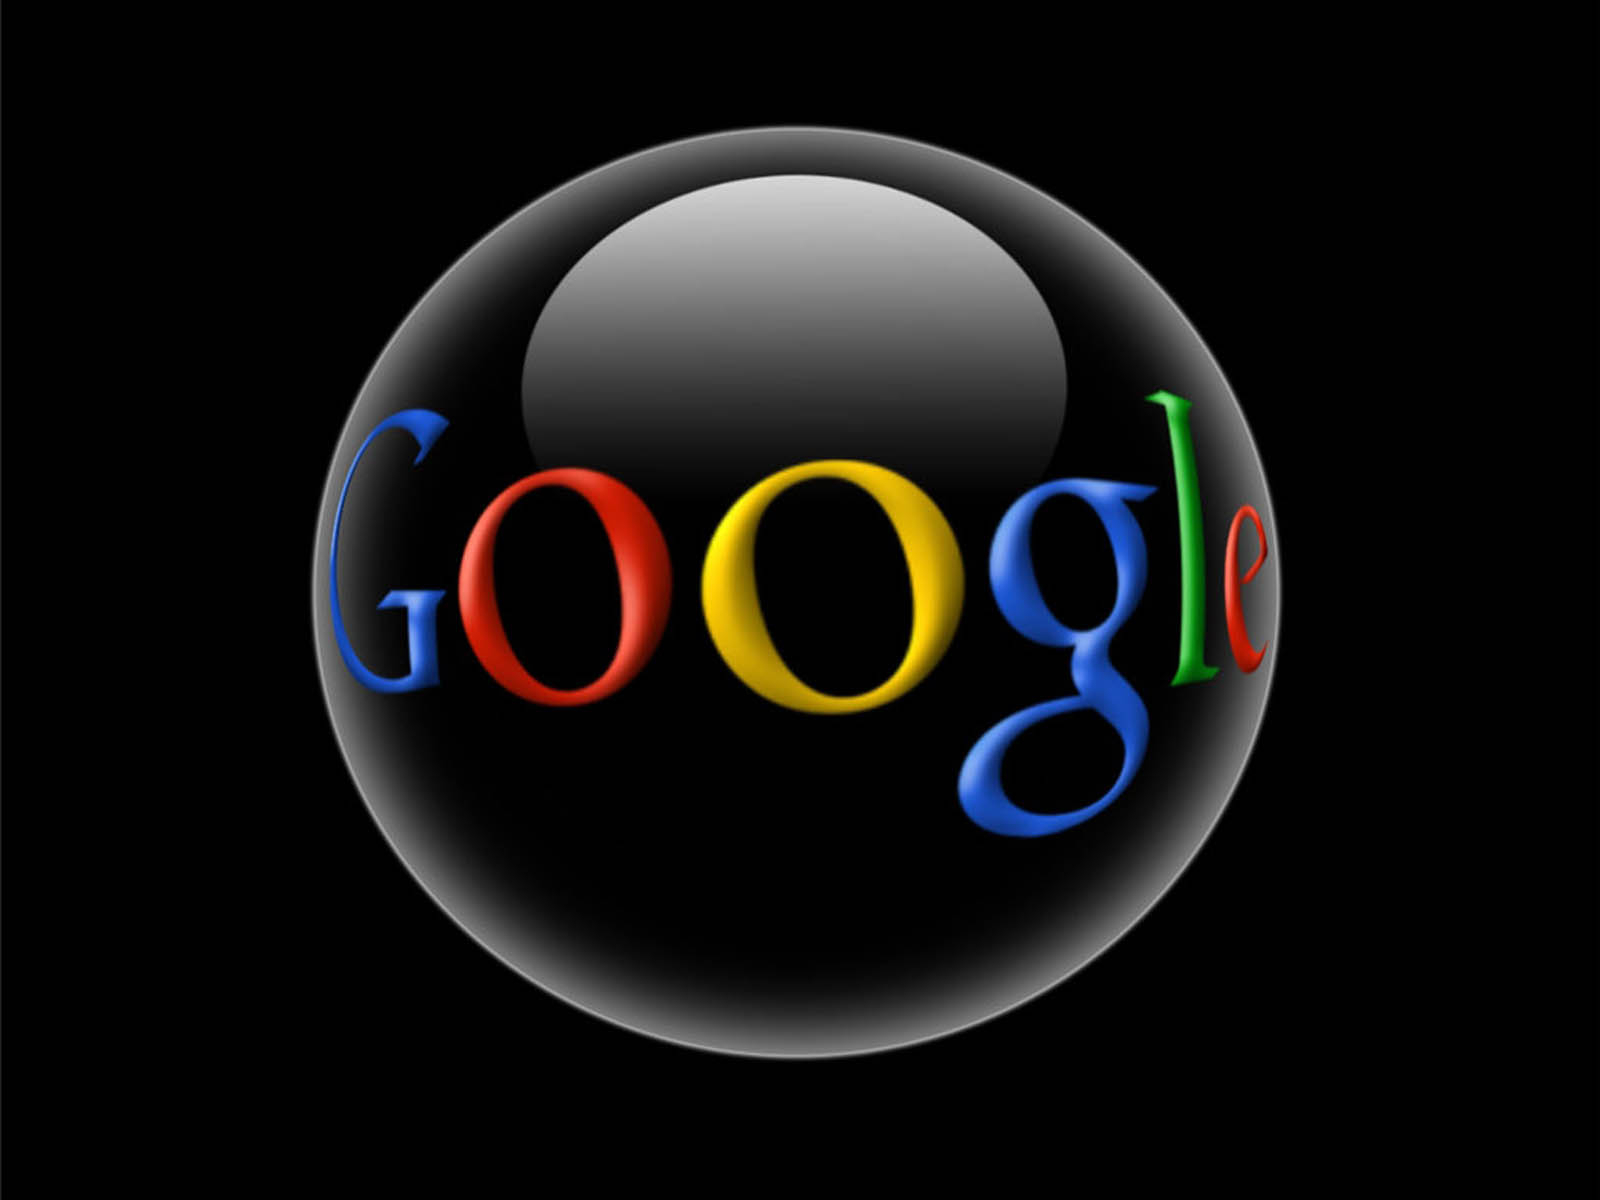 1600x1200px free google desktop wallpaper - wallpapersafari